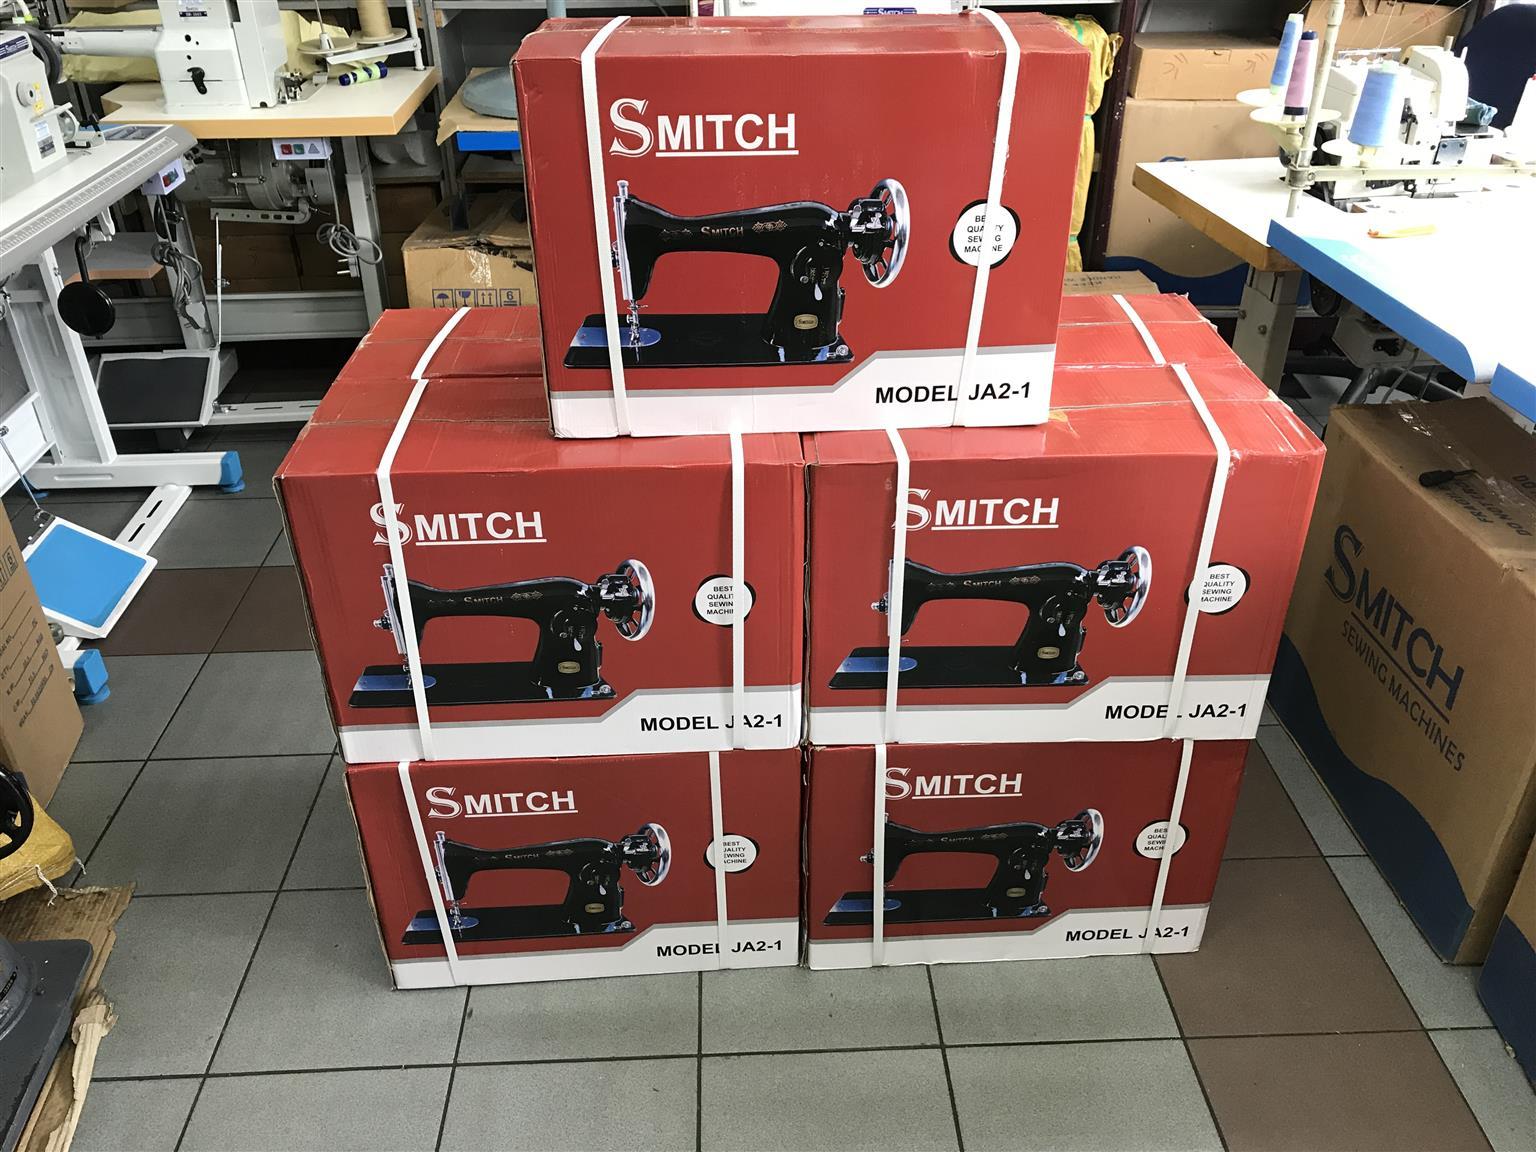 Brand new SMITCH Hand sewing machines